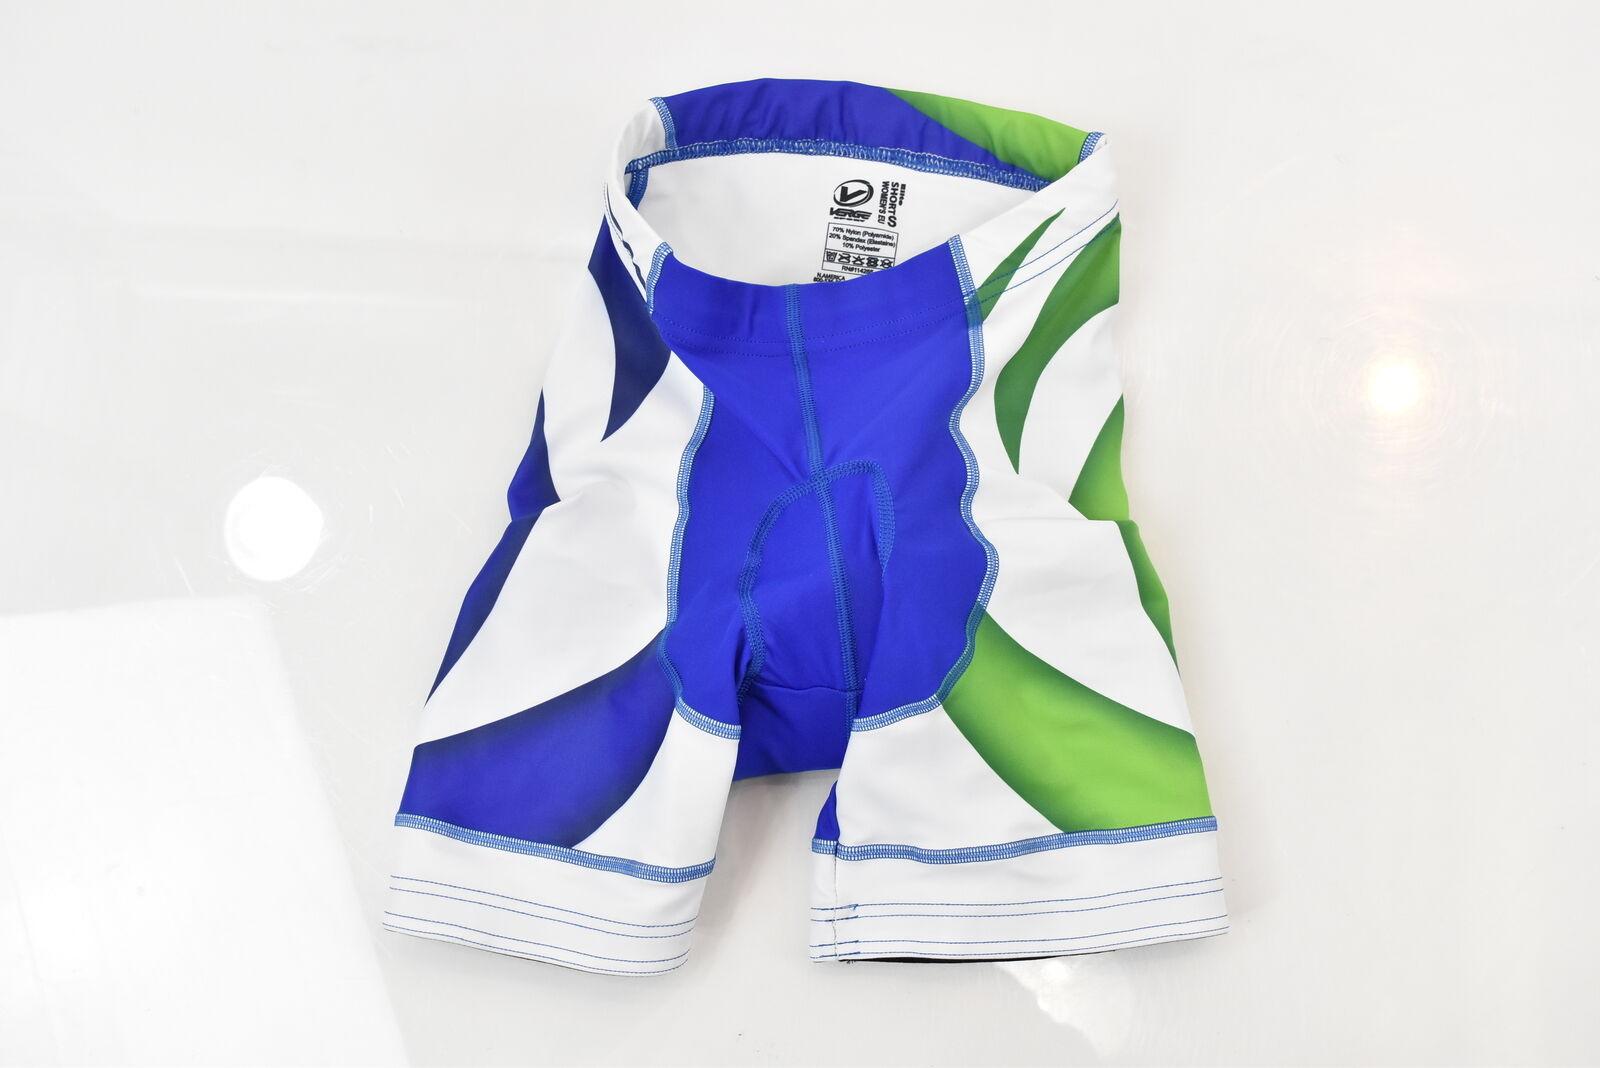 Verge lactic Acid Racing Girl elite euro bicicletas deportes shorts verde   azules nuevos